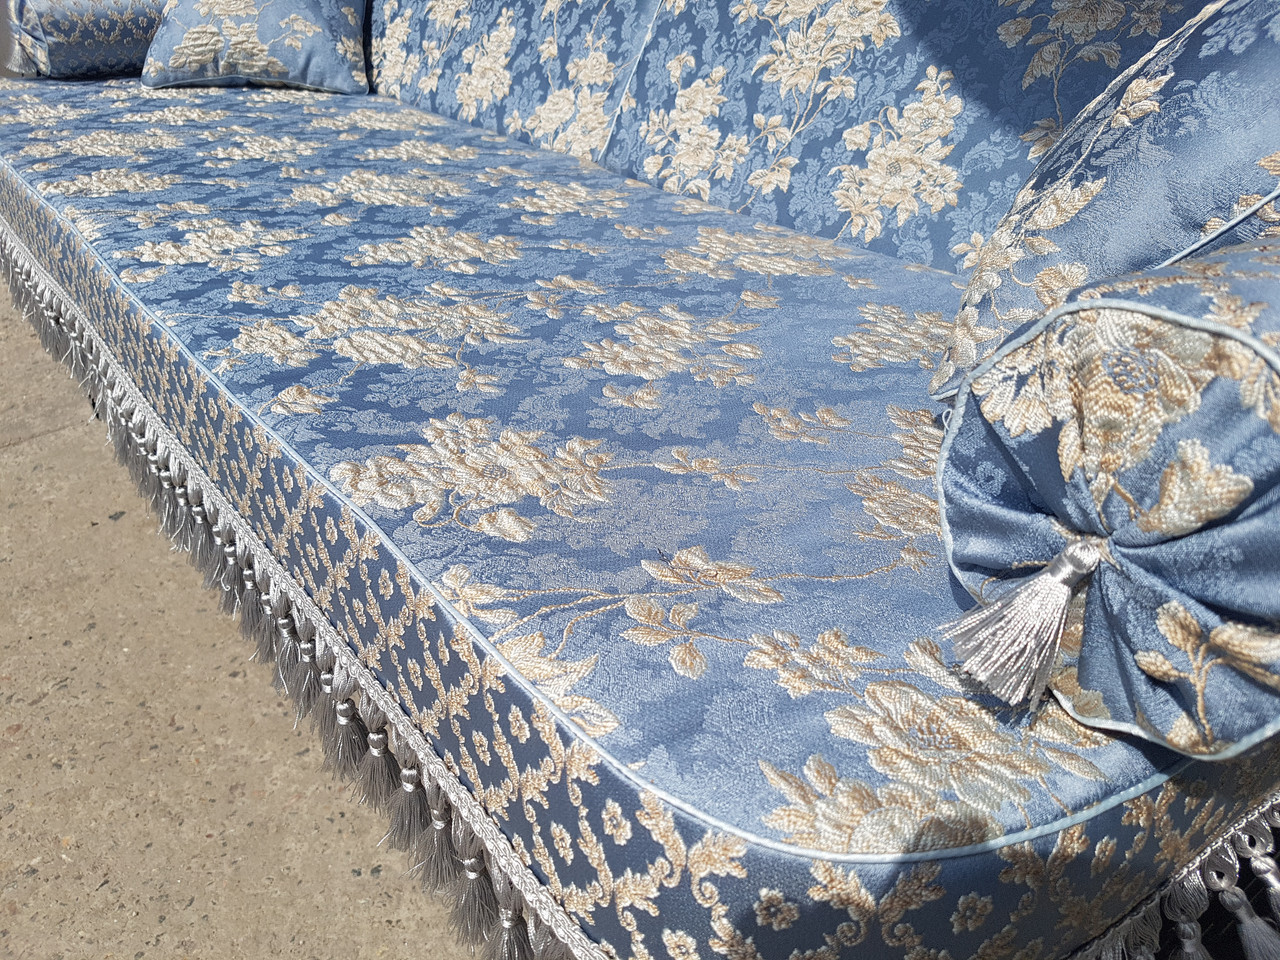 rud exhaust system Качеля садовая Spring-Swing Barokko Blue-Silver (БЕСПЛАТНАЯ ДОСТАВКА ПО УКРАИНЕ) 700109